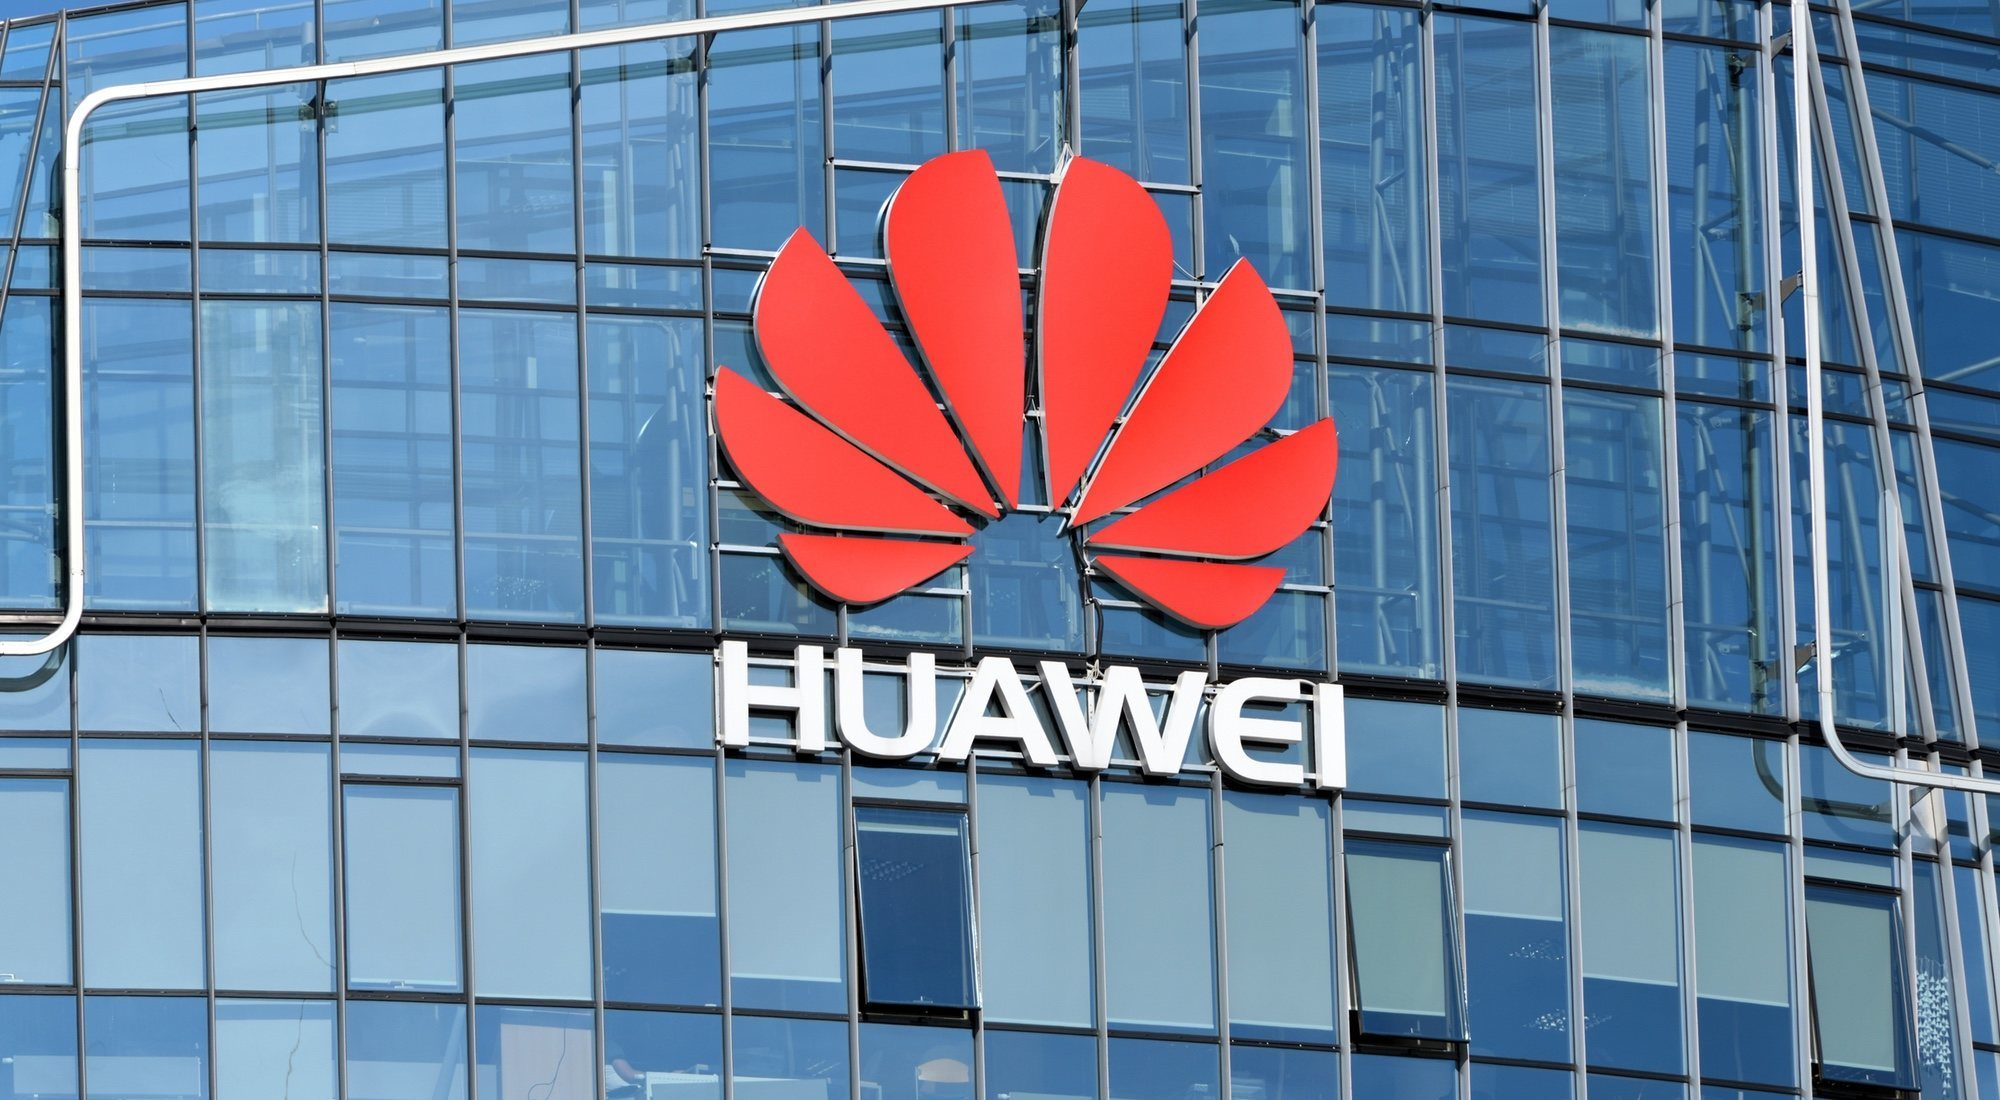 ArkOS: características del sistema operativo de Huawei